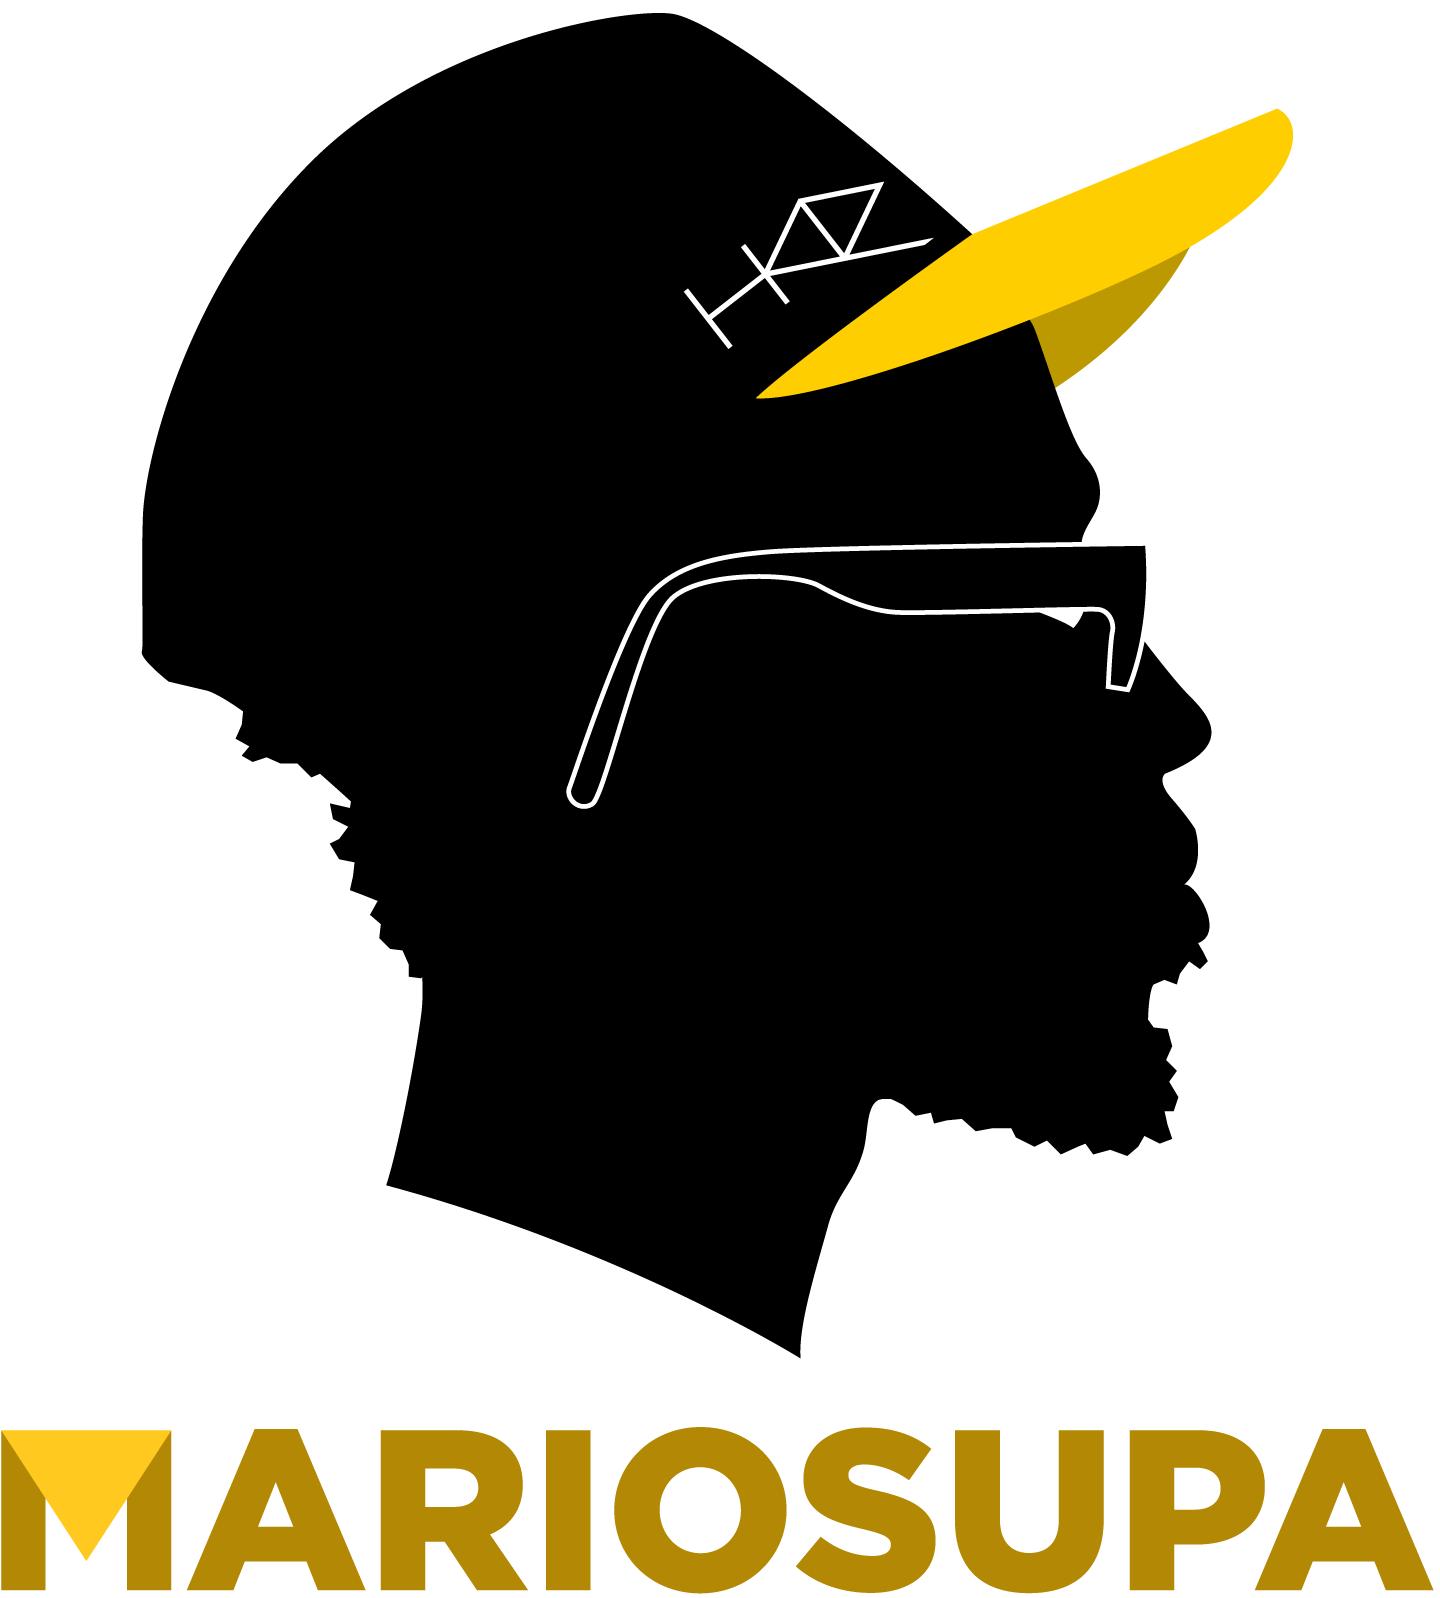 MARIOSUPA